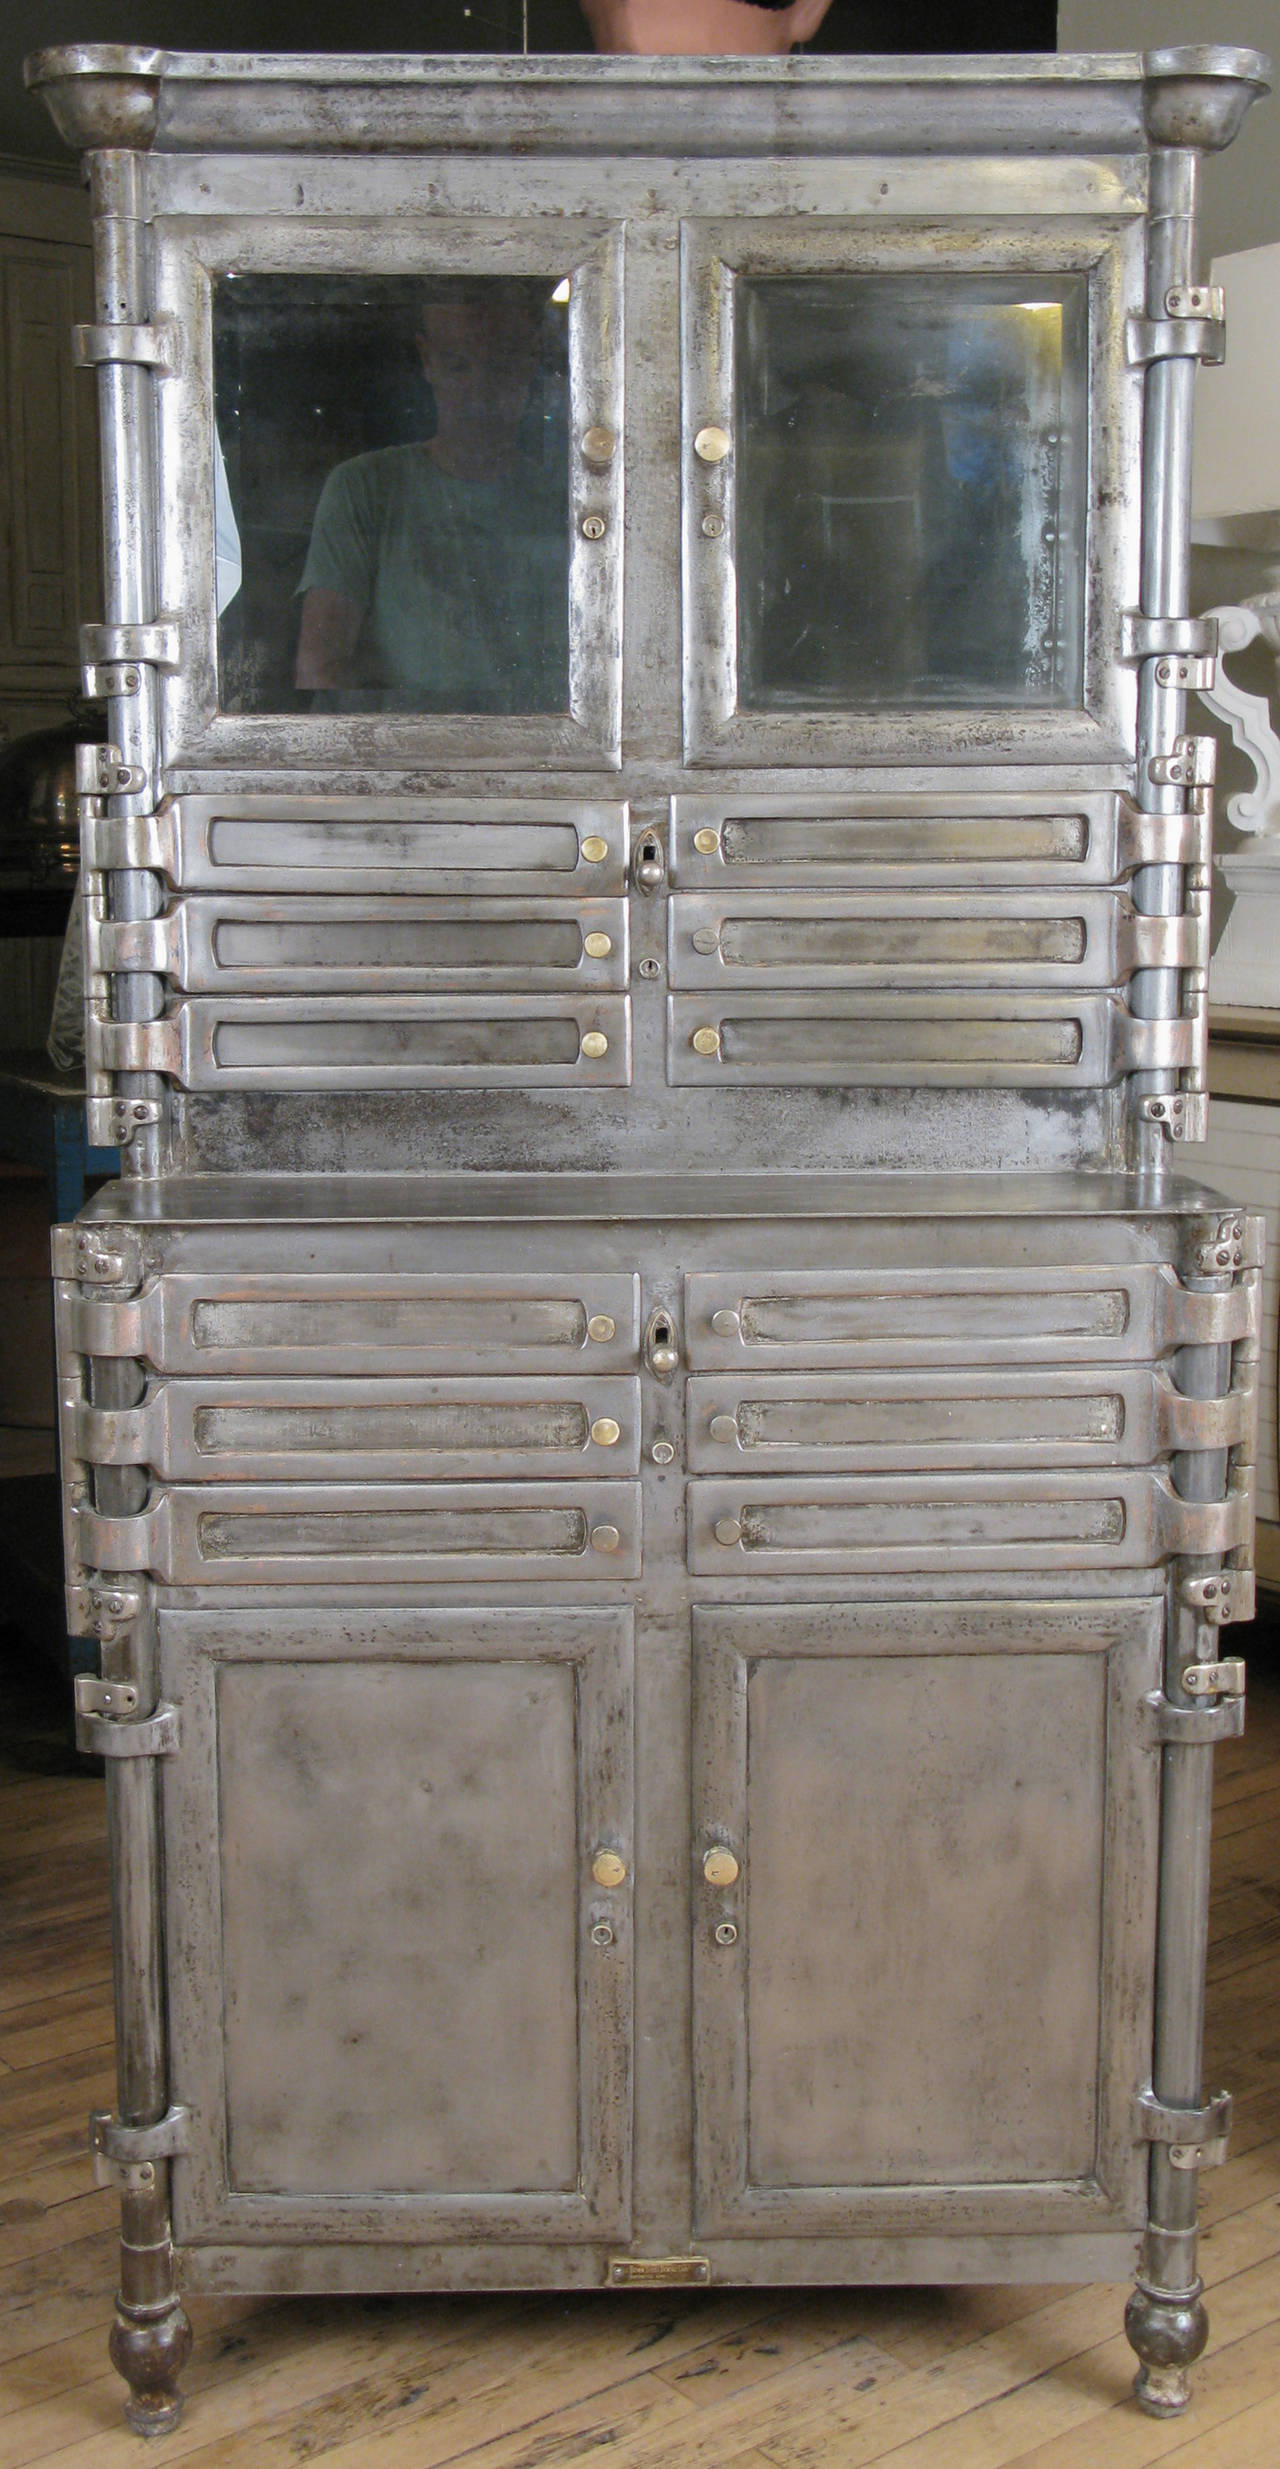 Antique Steel And Glass Medical Dental Cabinet At 1stdibs